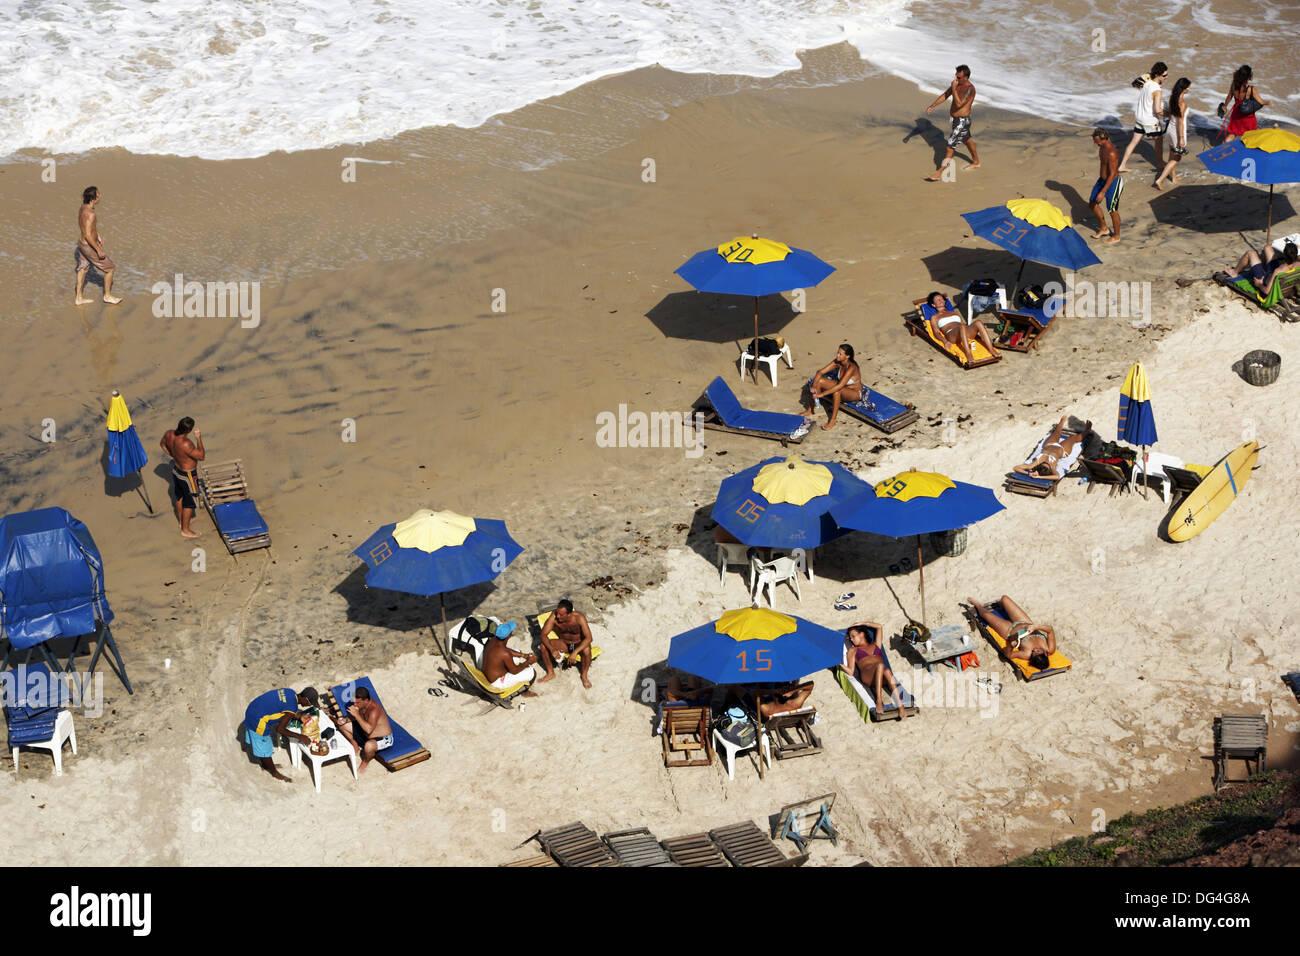 Praia do Amor, Pipa, Tibau do Sul, Rio Grande del Norte, Brasil Imagen De Stock